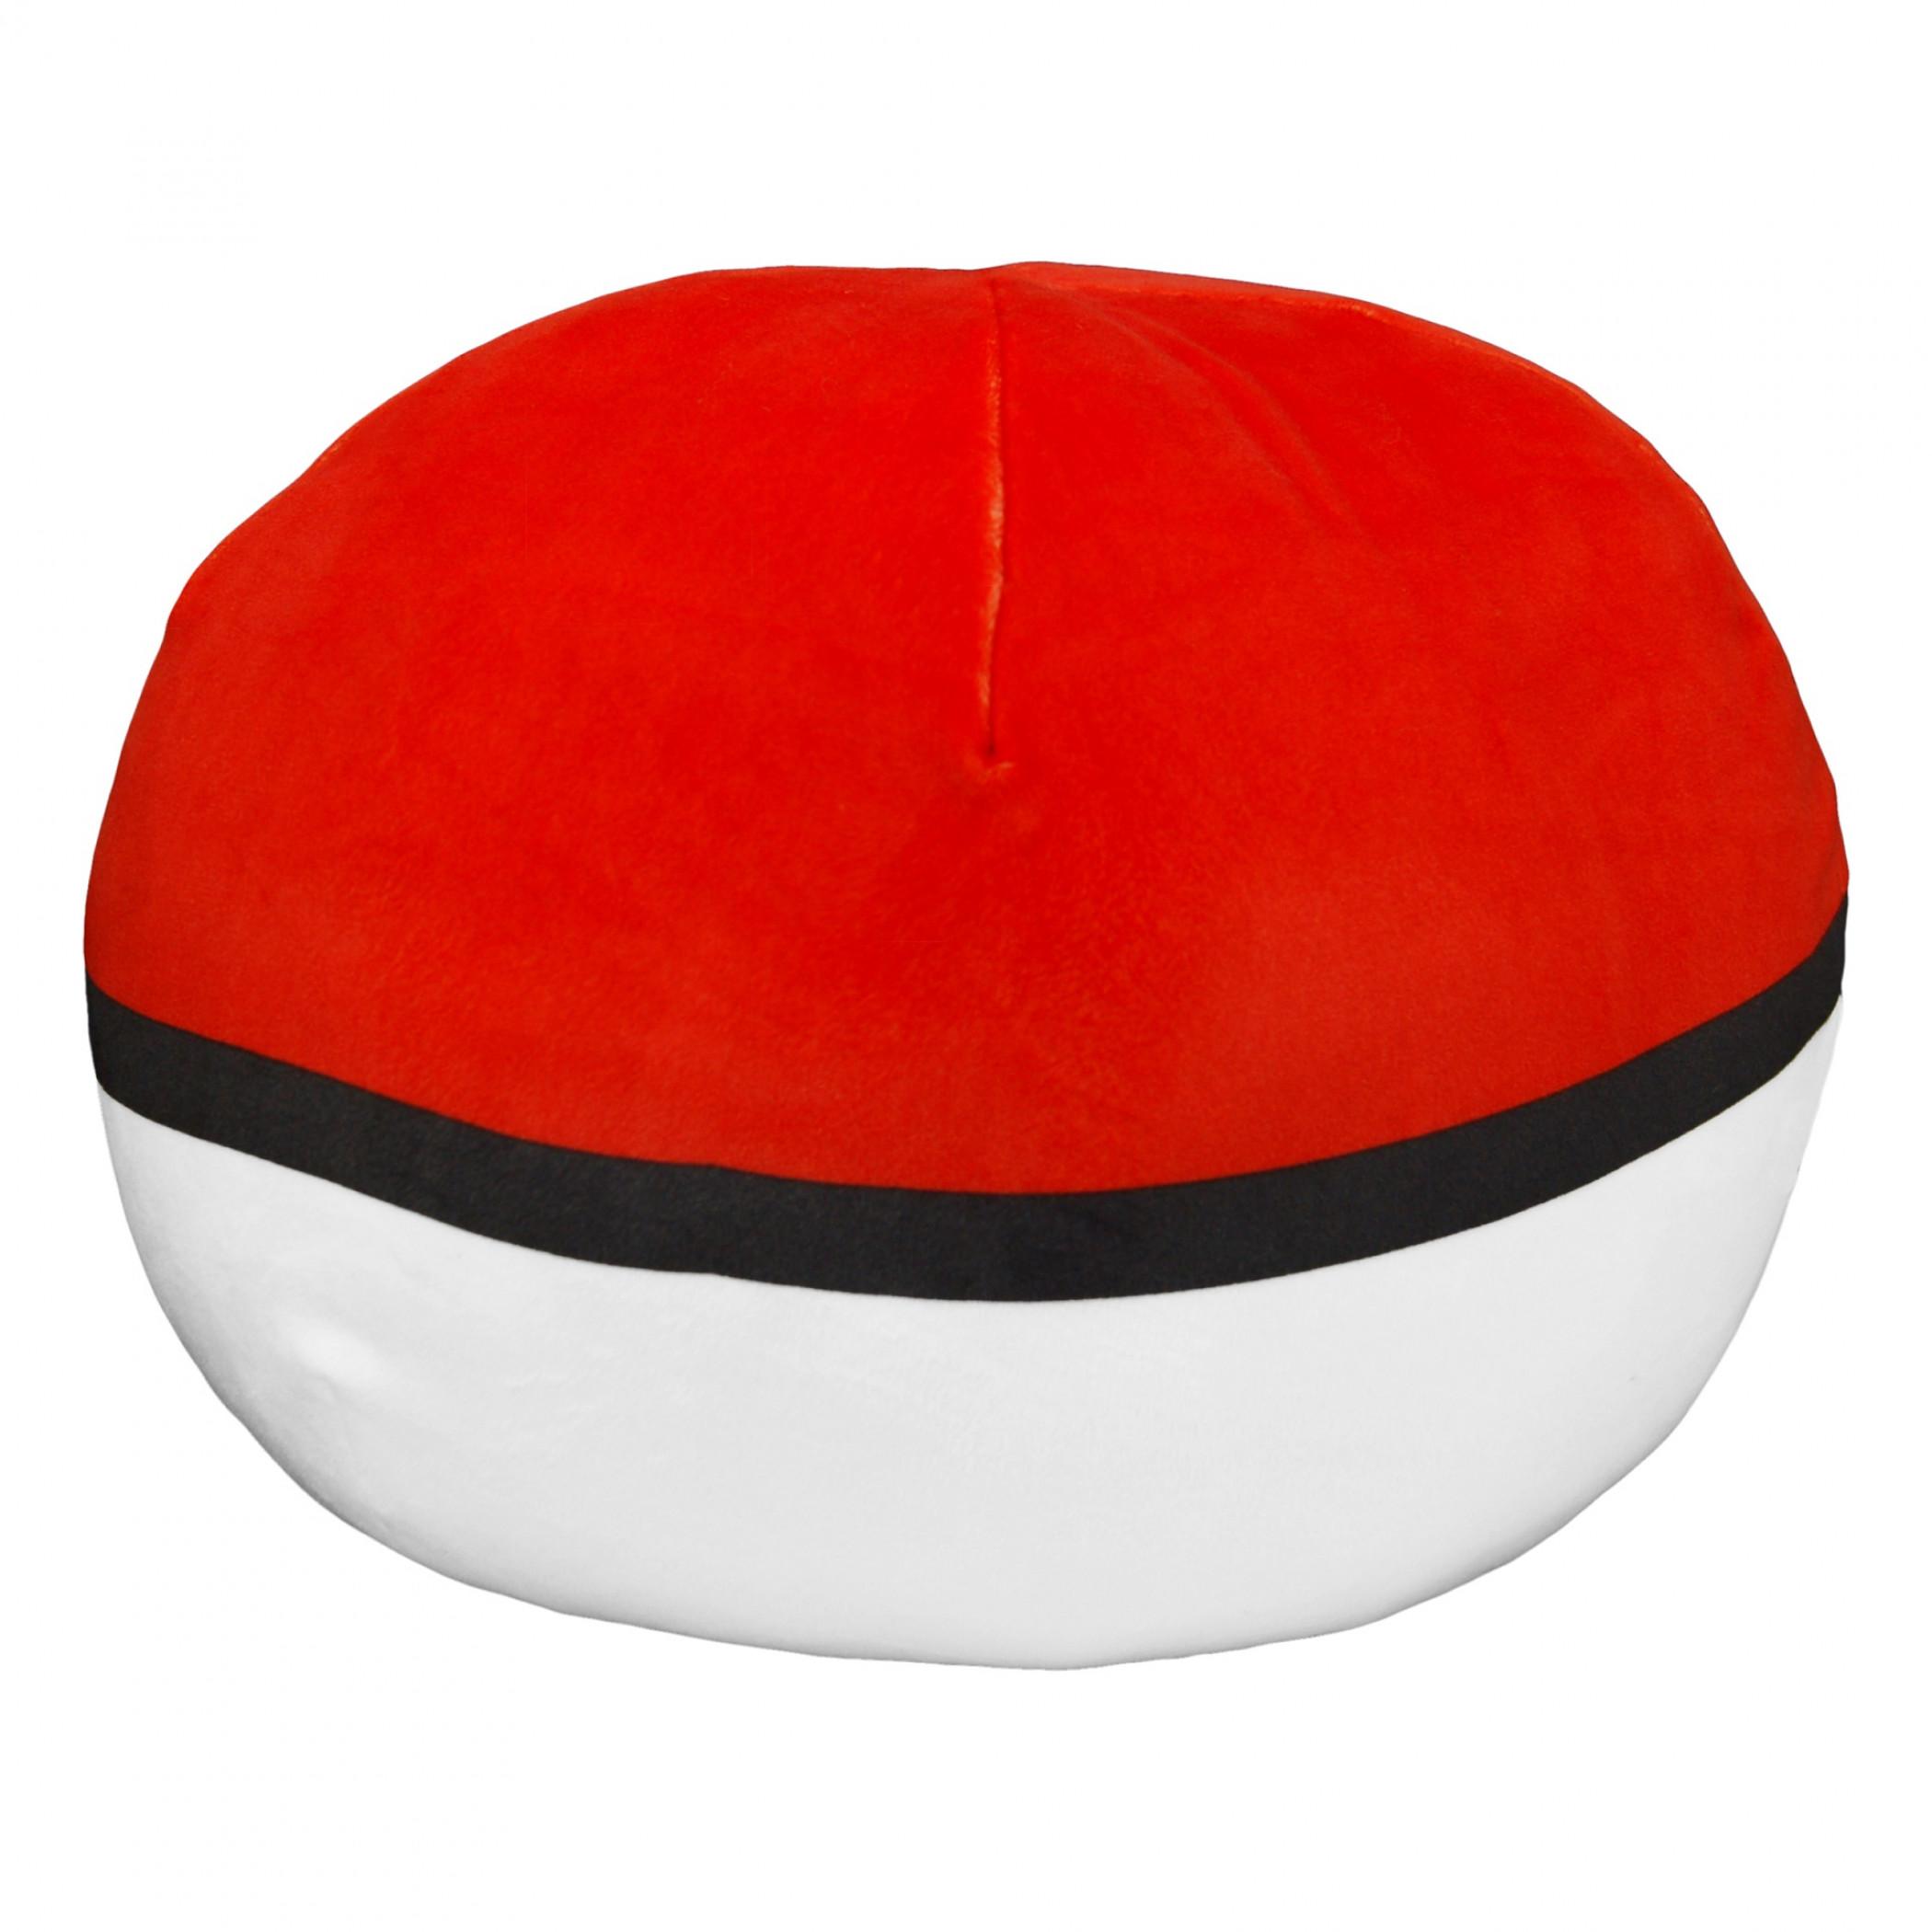 "Pokemon Pokeball 11"" Round Cloud Pillow"